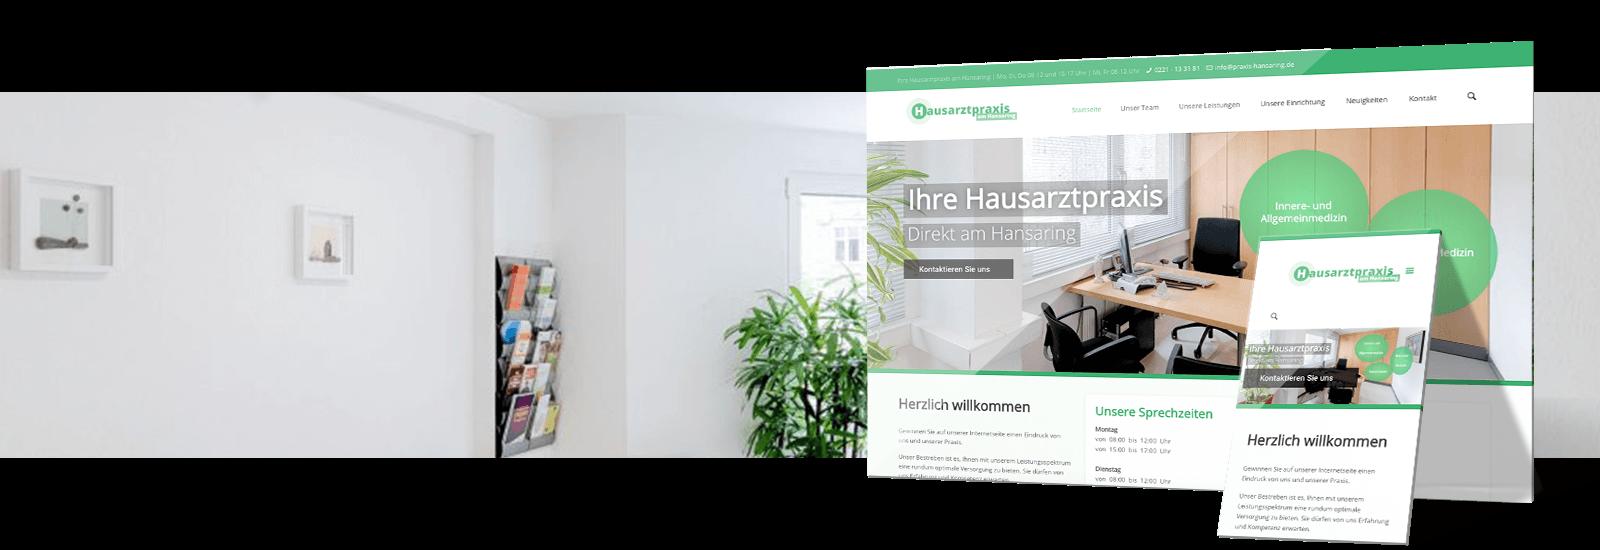 praxis homepage - referenz webdesign.koeln - praxis hansaring